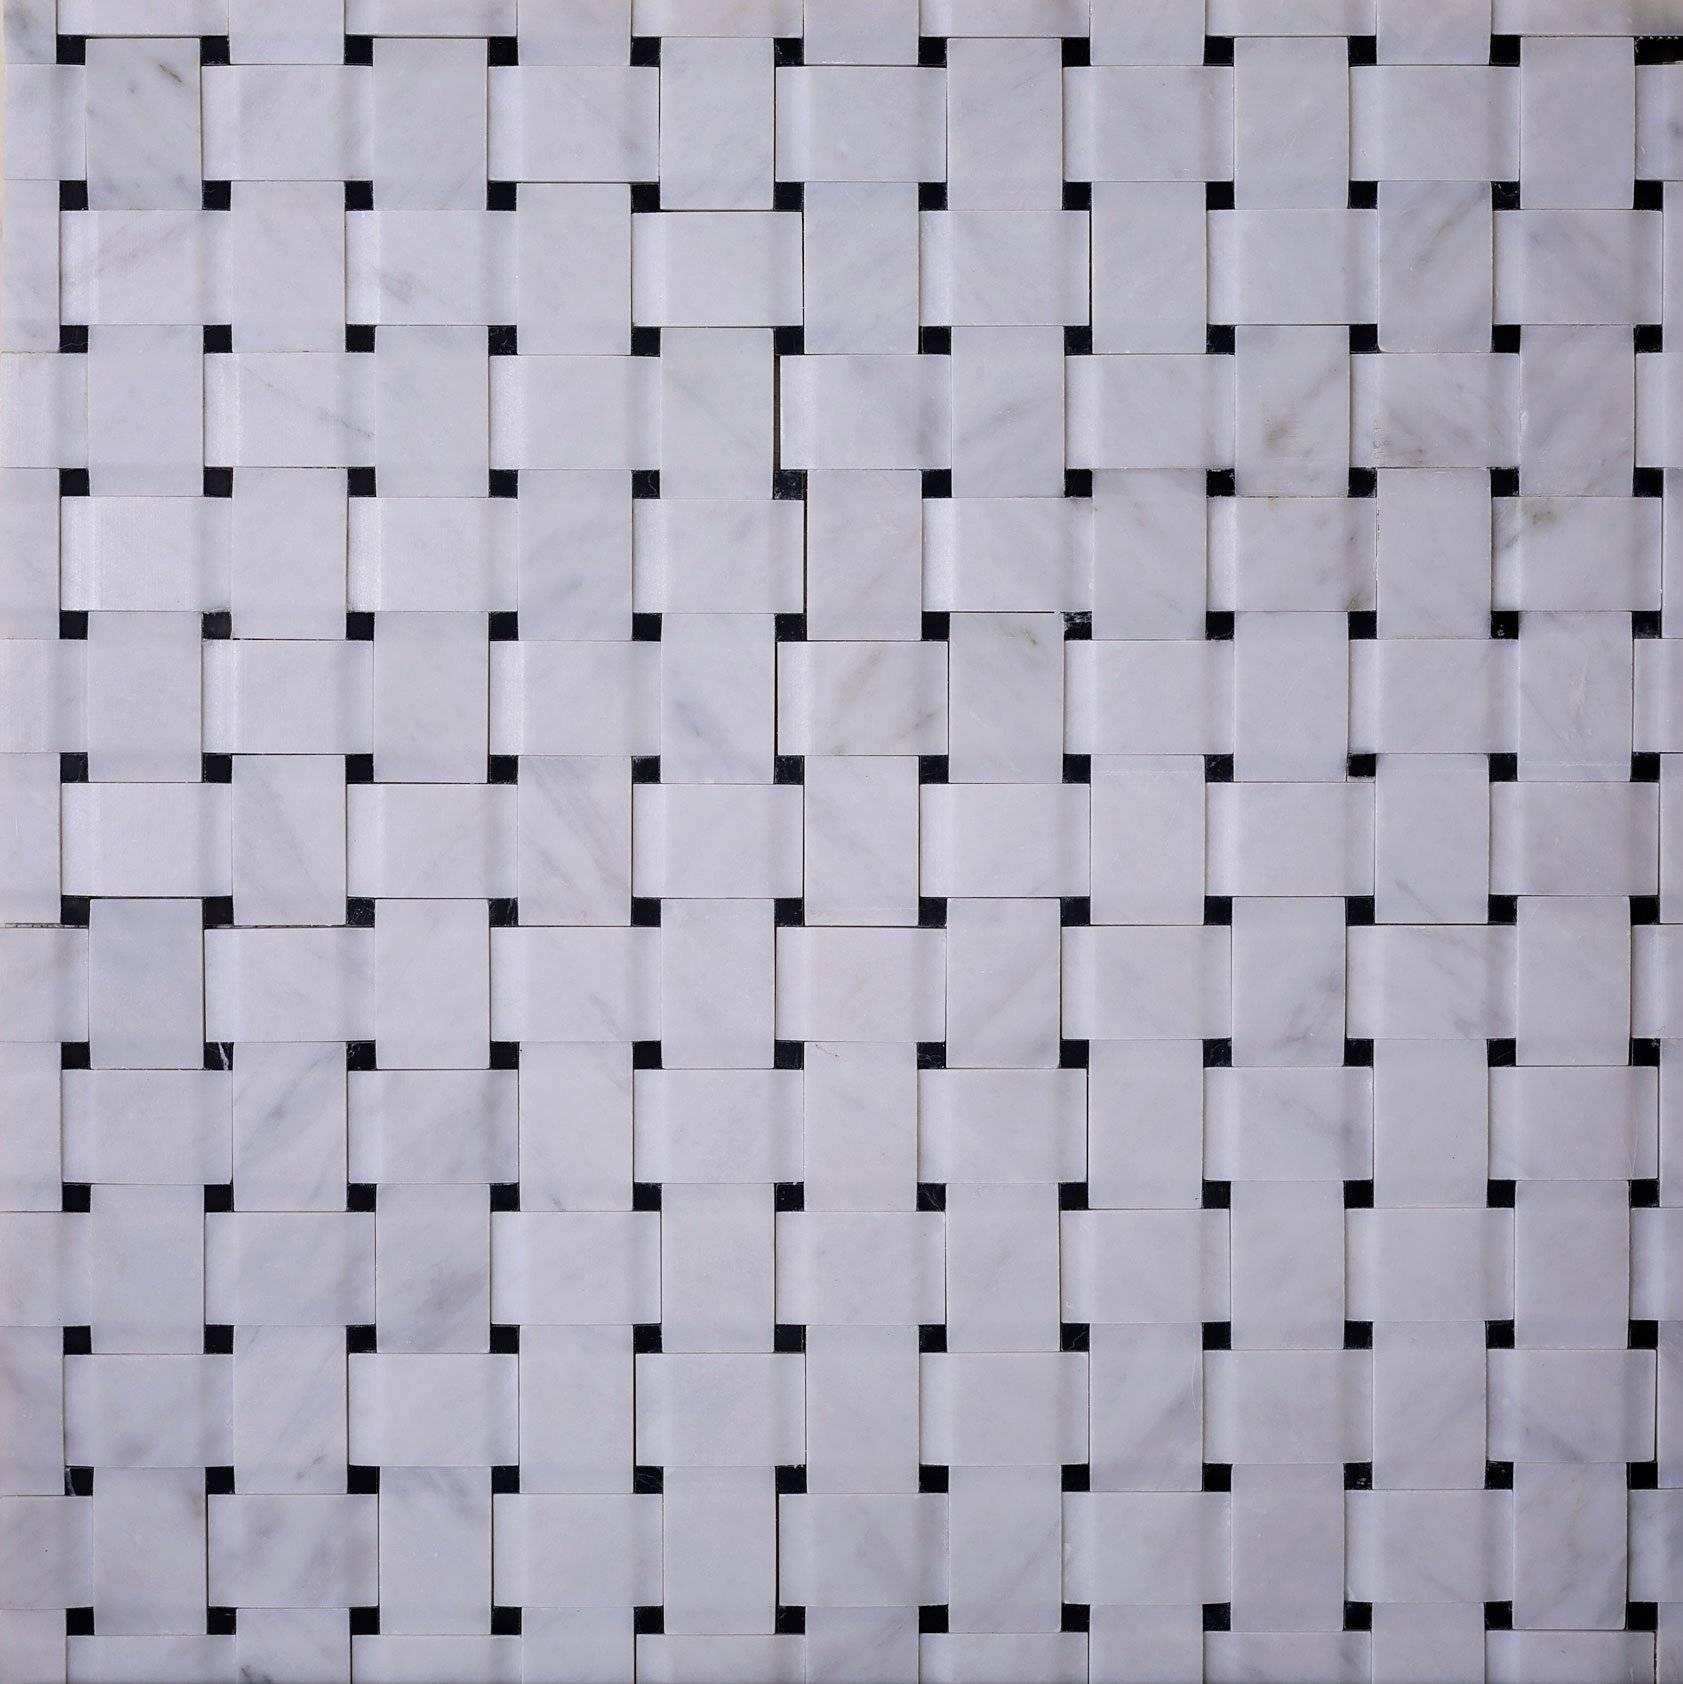 duomo 3d basket weave nero marquina mosaic tile 2